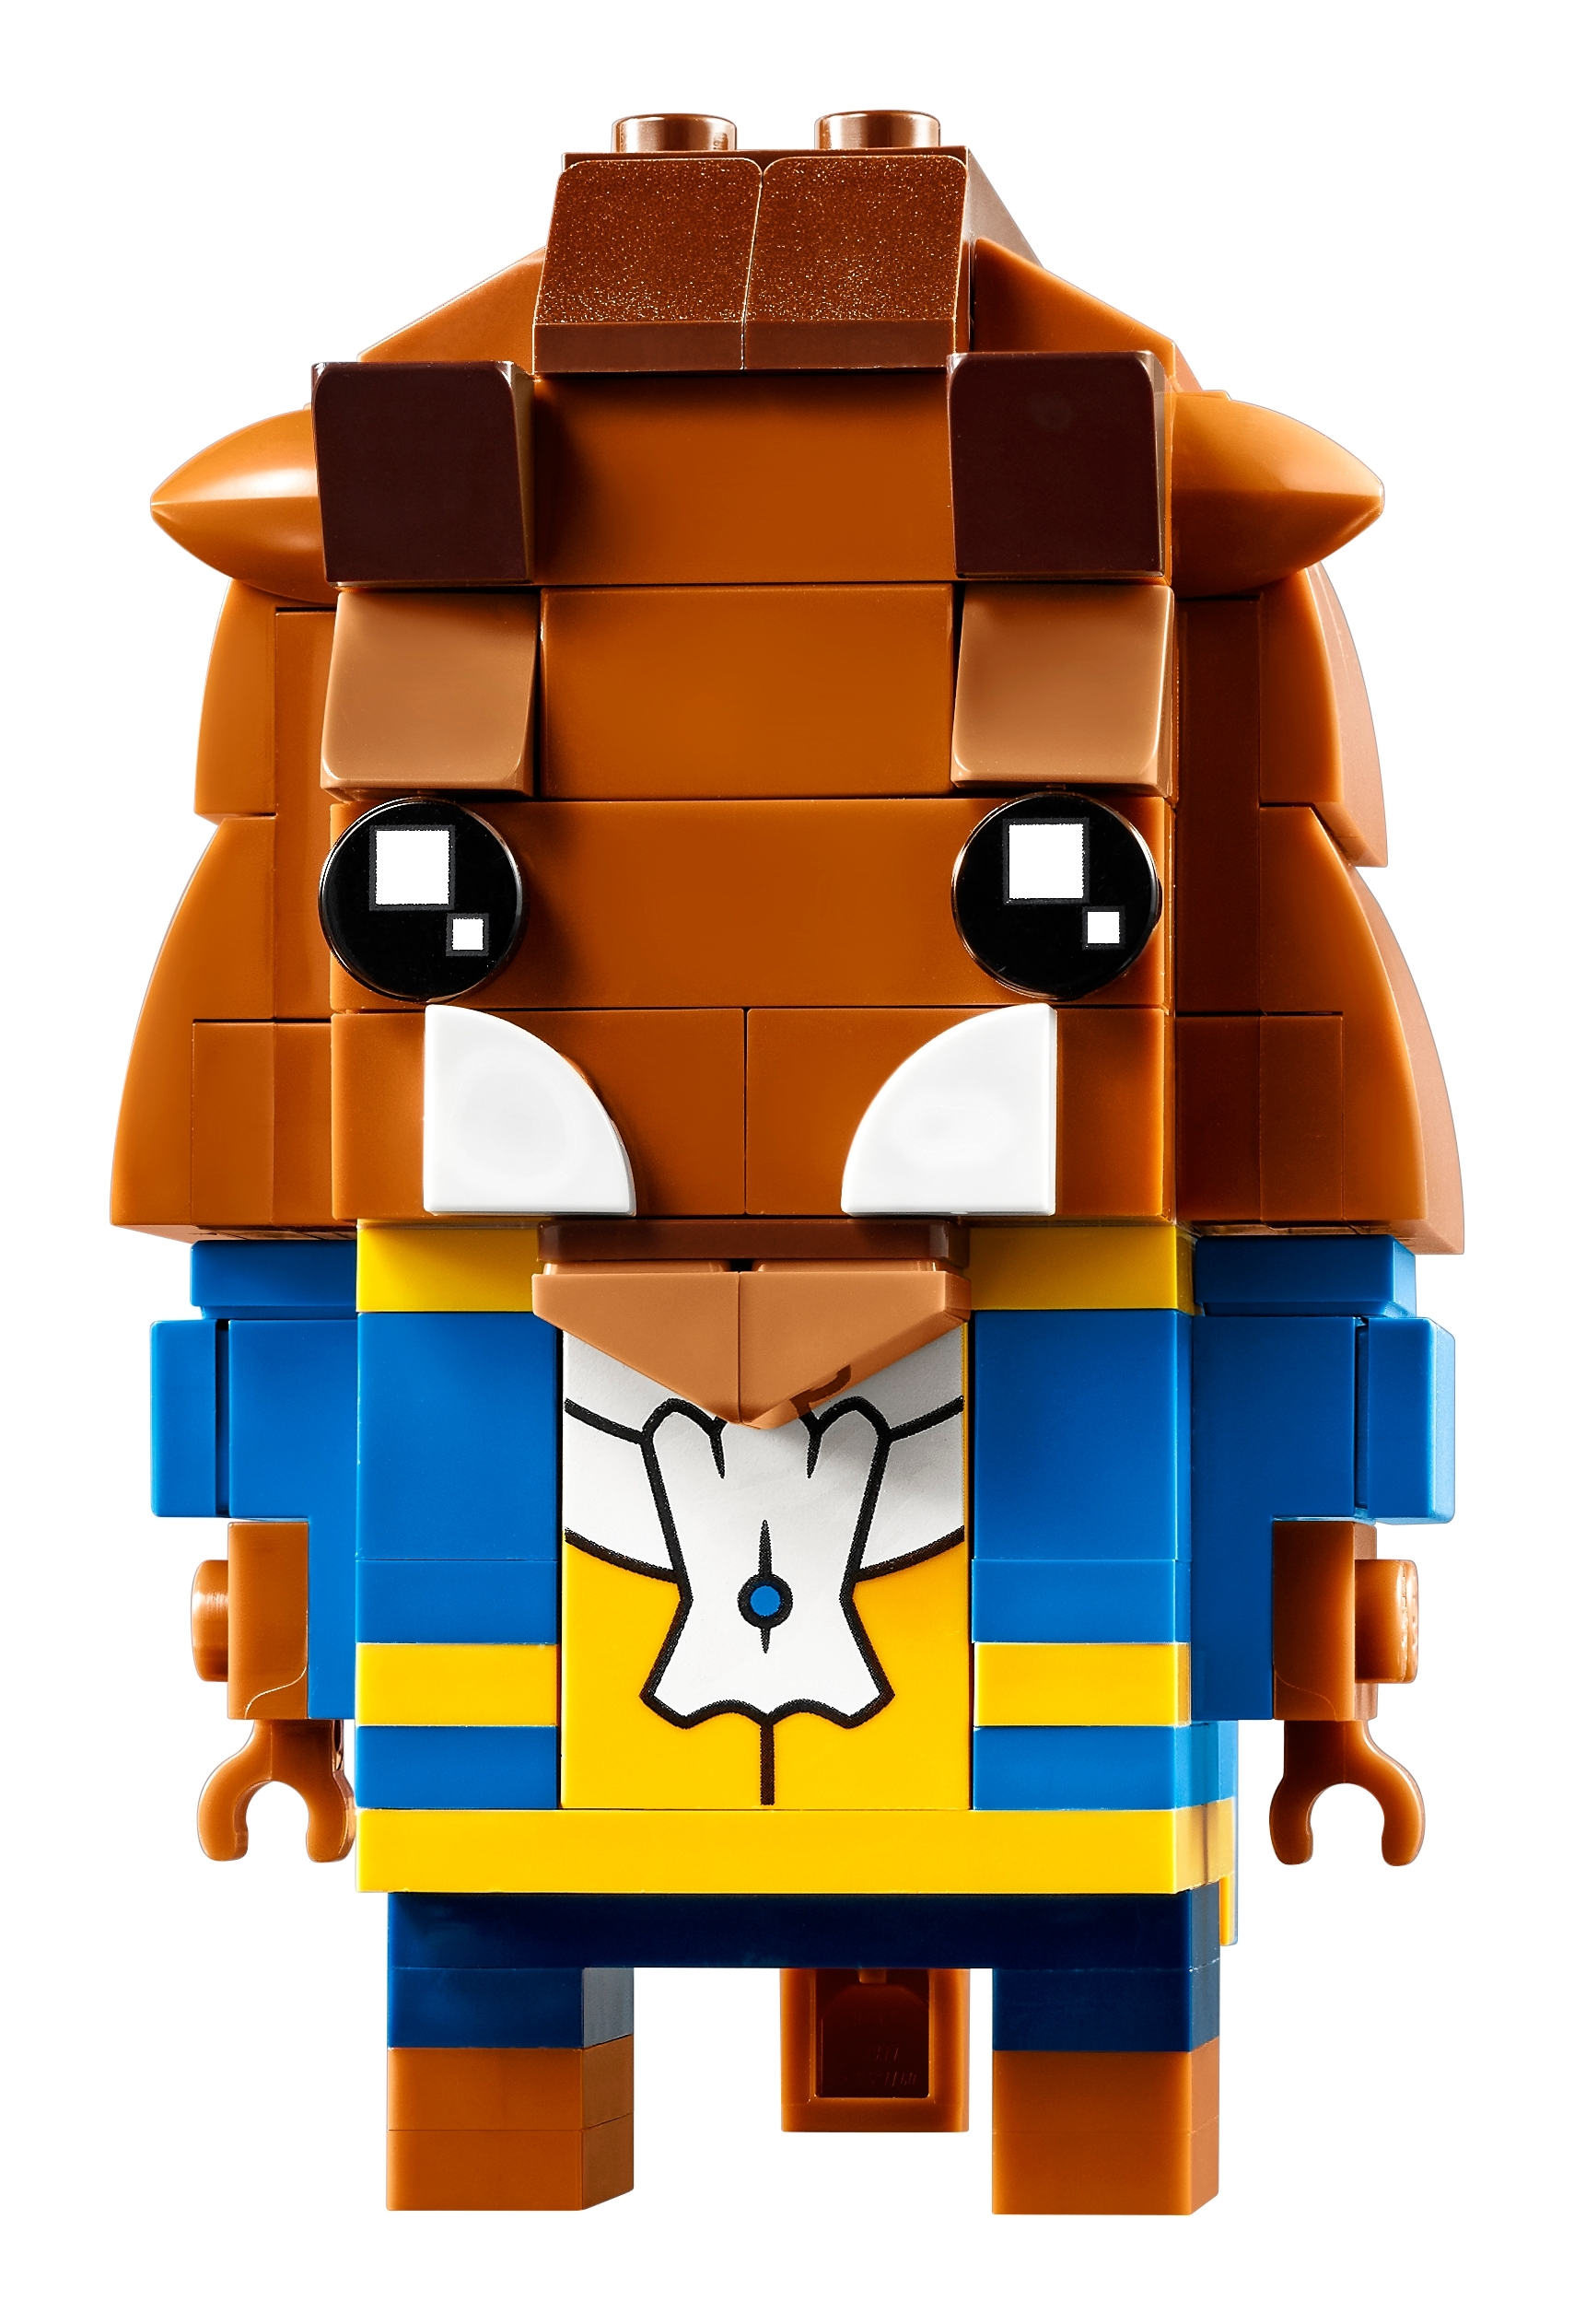 LEGO BrickHeadz Beast 41596 Disney Beauty and the Beast New